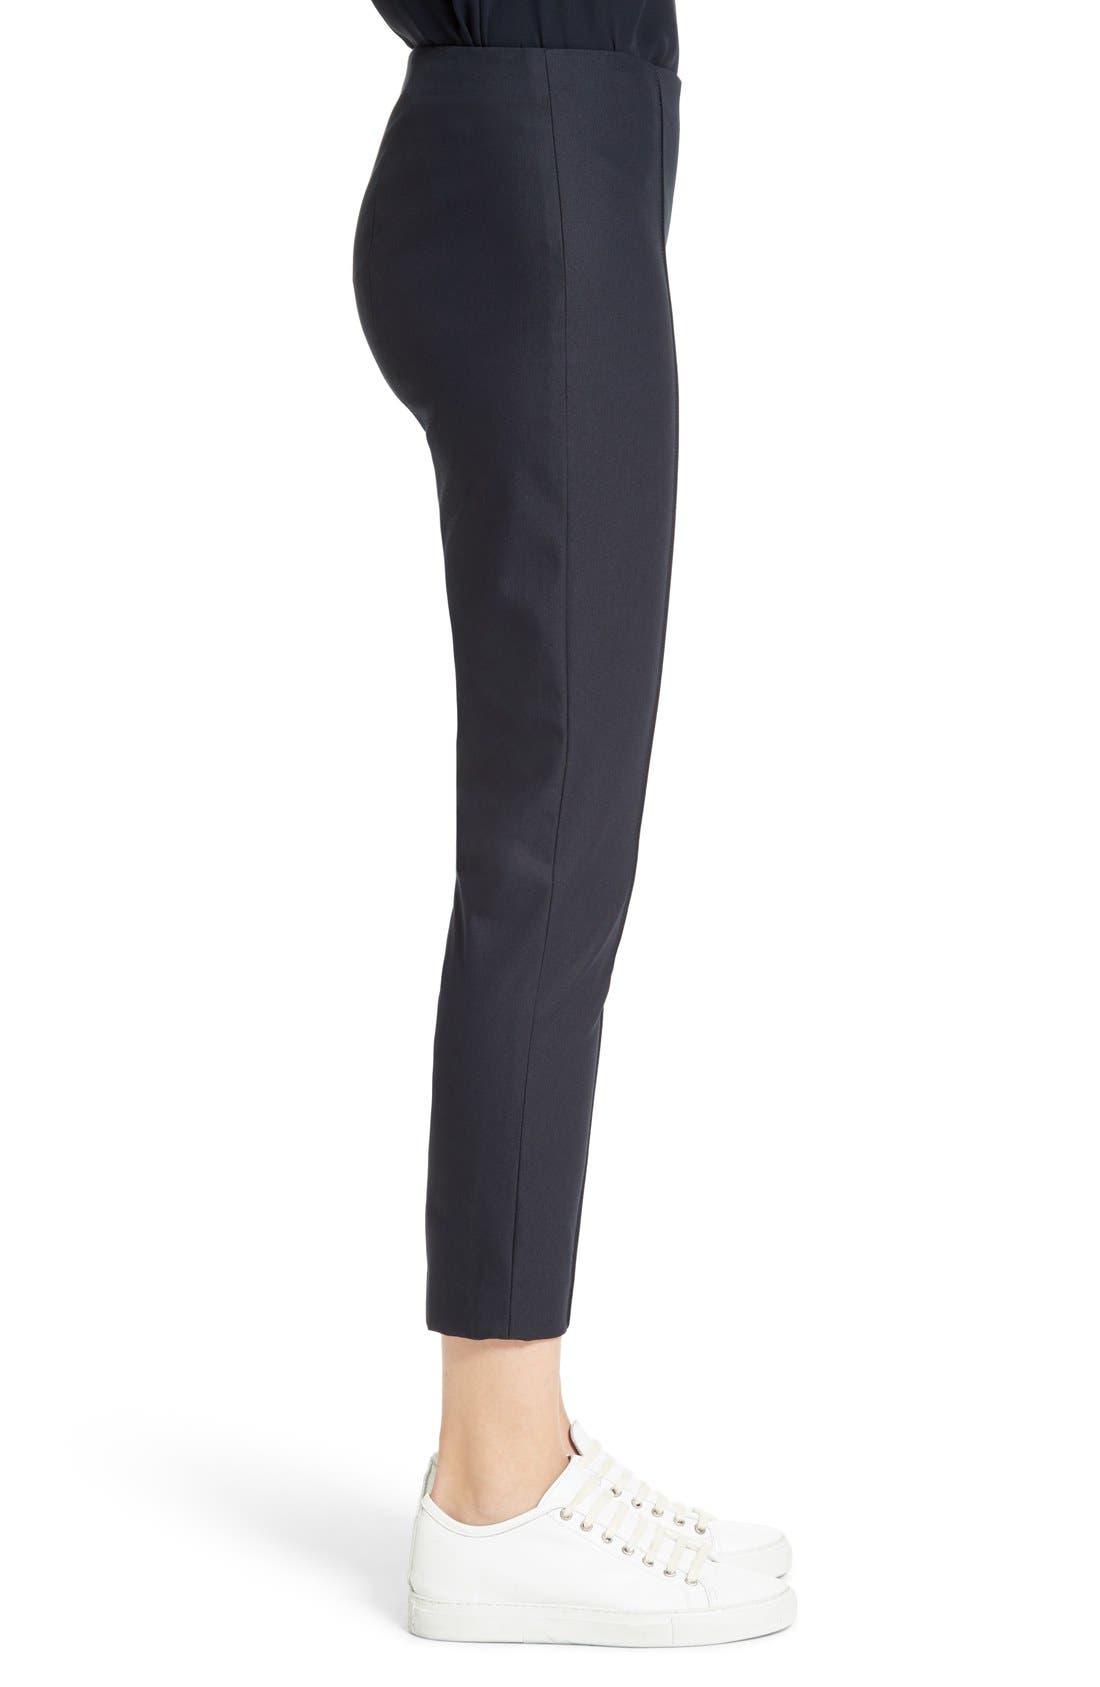 Alettah Stretch Skinny Pants,                             Alternate thumbnail 8, color,                             001